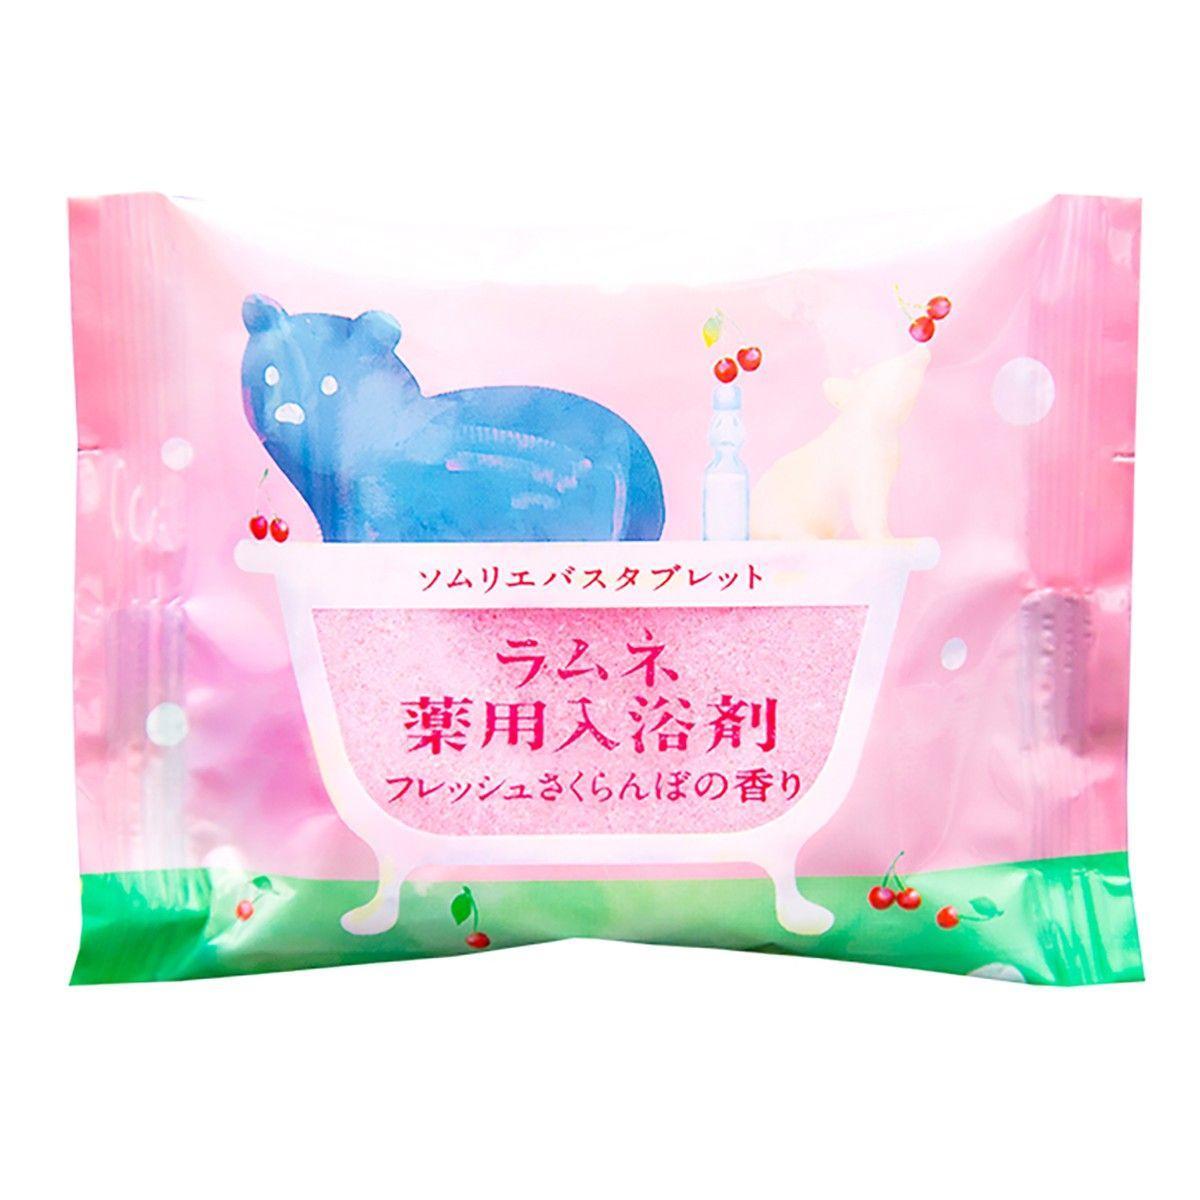 Расслабляющая соль-таблетка для ванны с ароматом цветущей сакуры - 40 гр.-6644